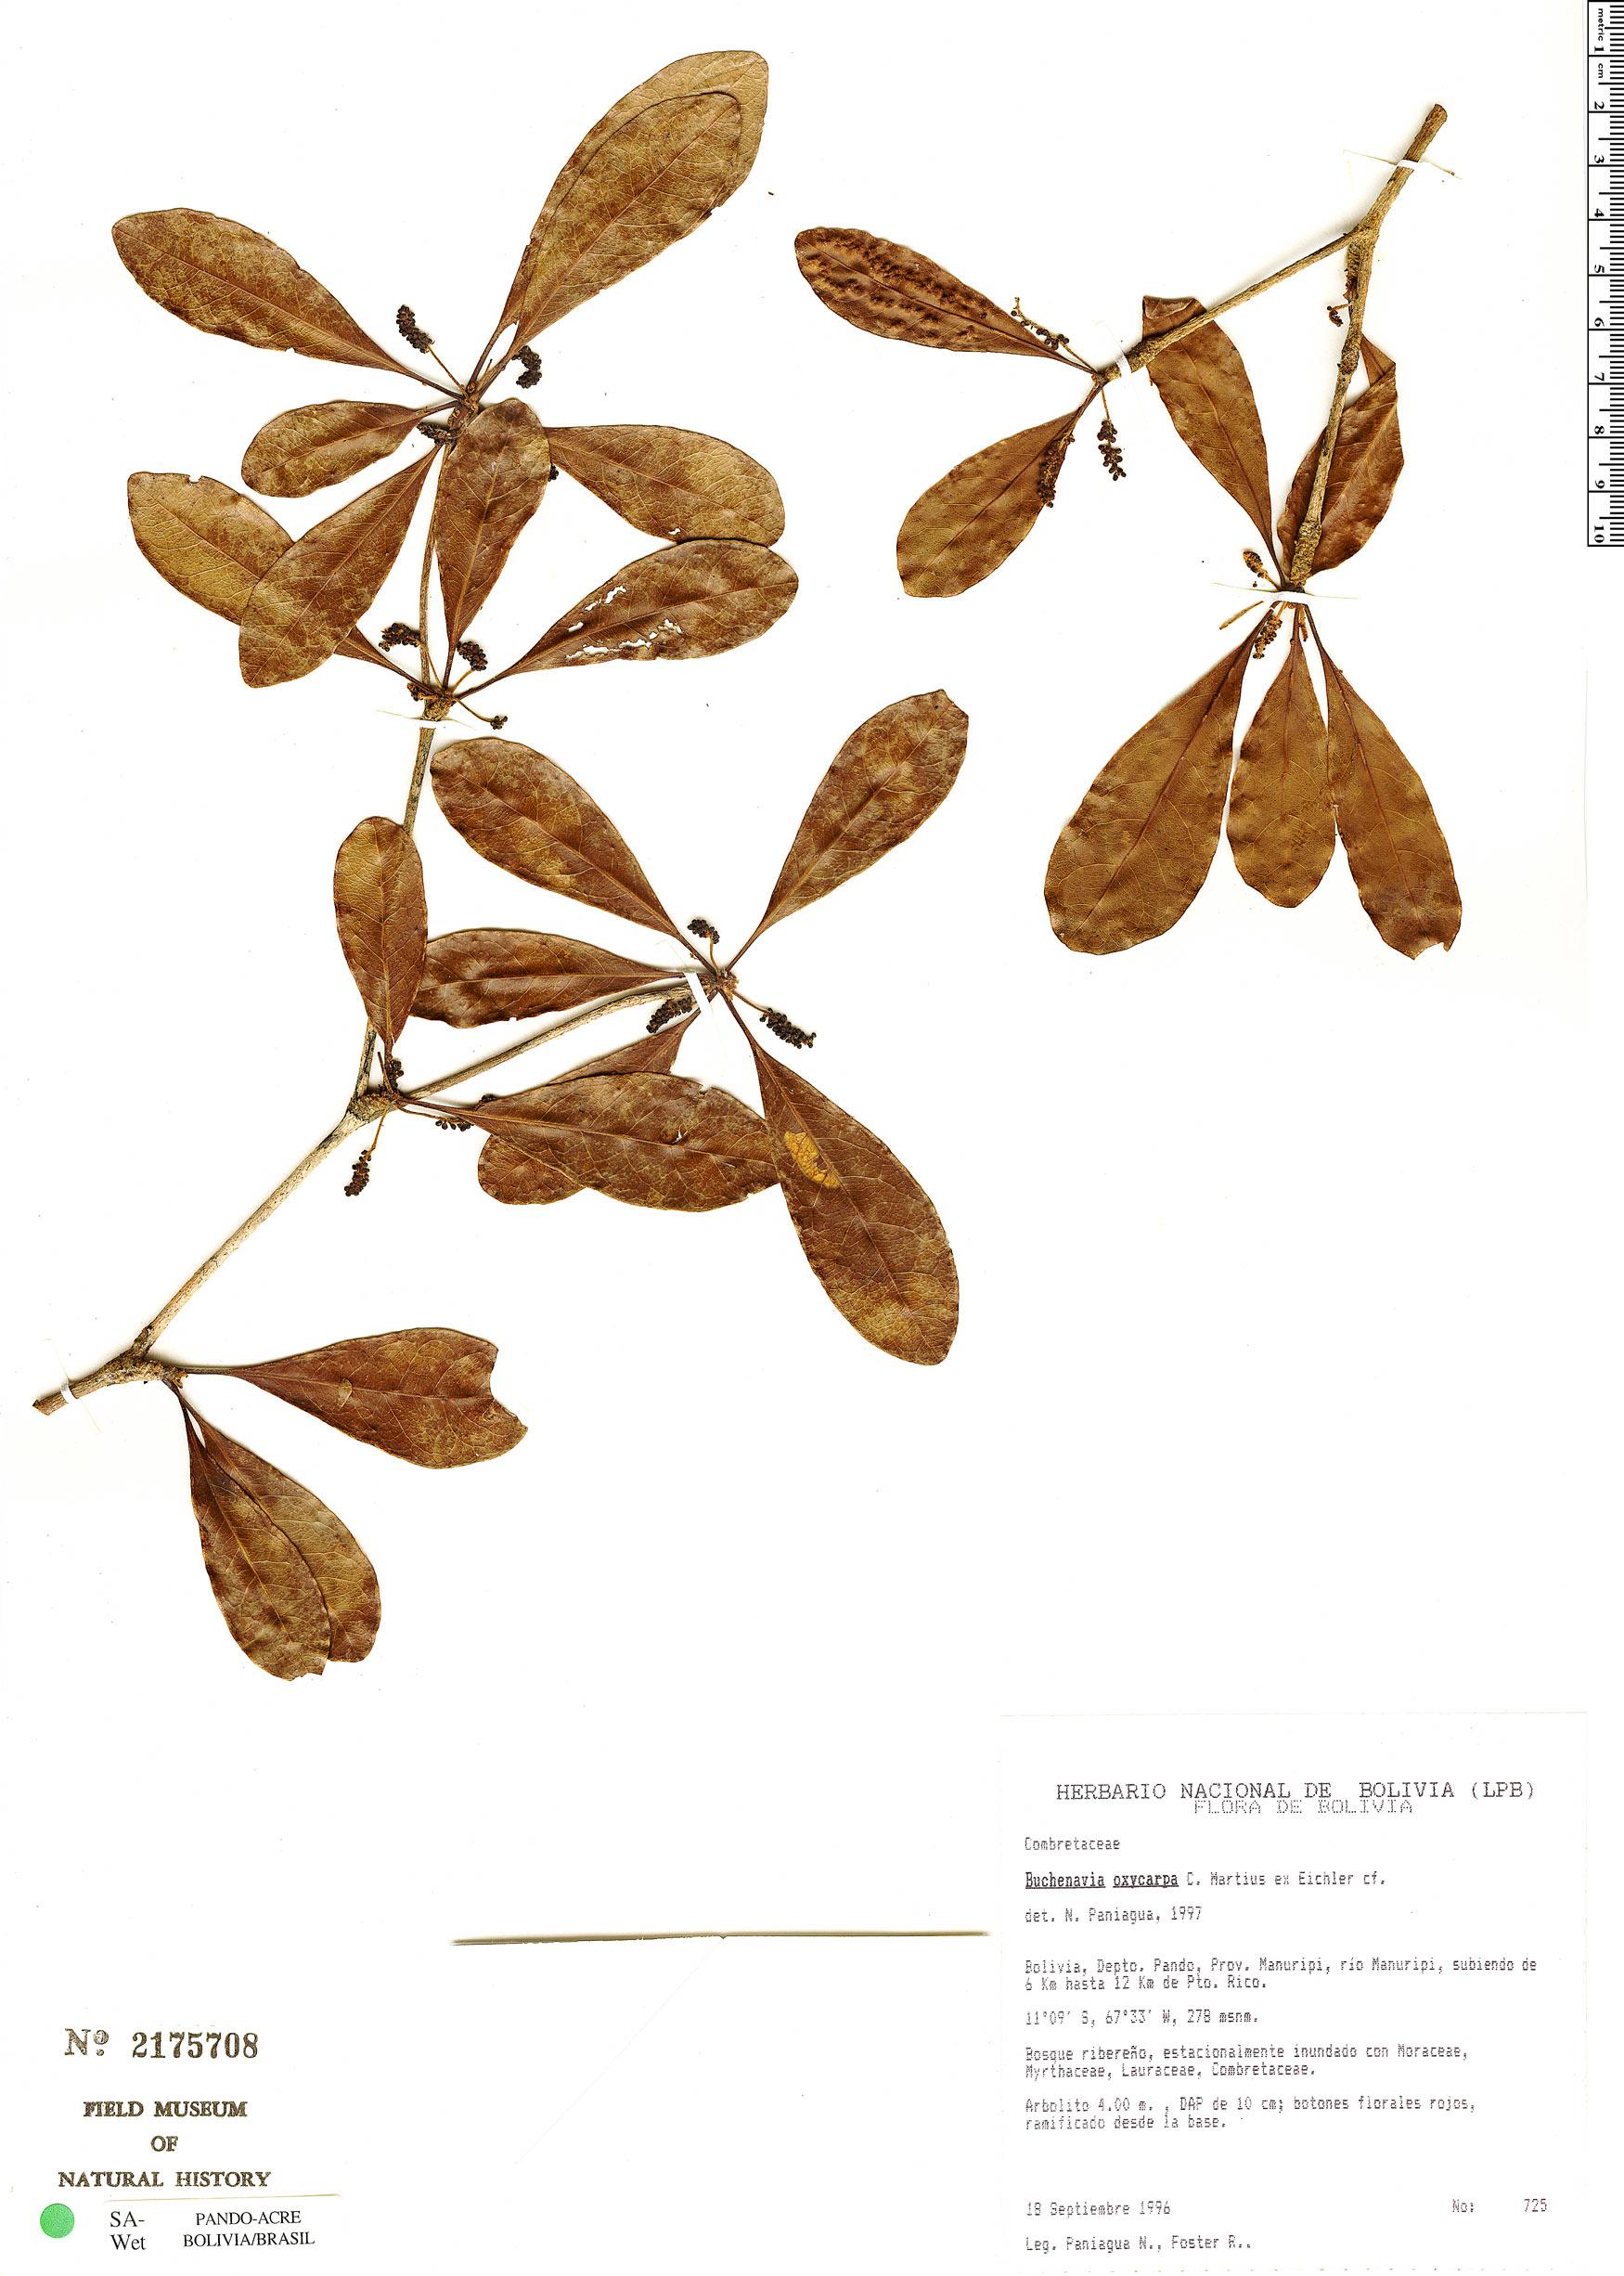 Espécime: Buchenavia oxycarpa